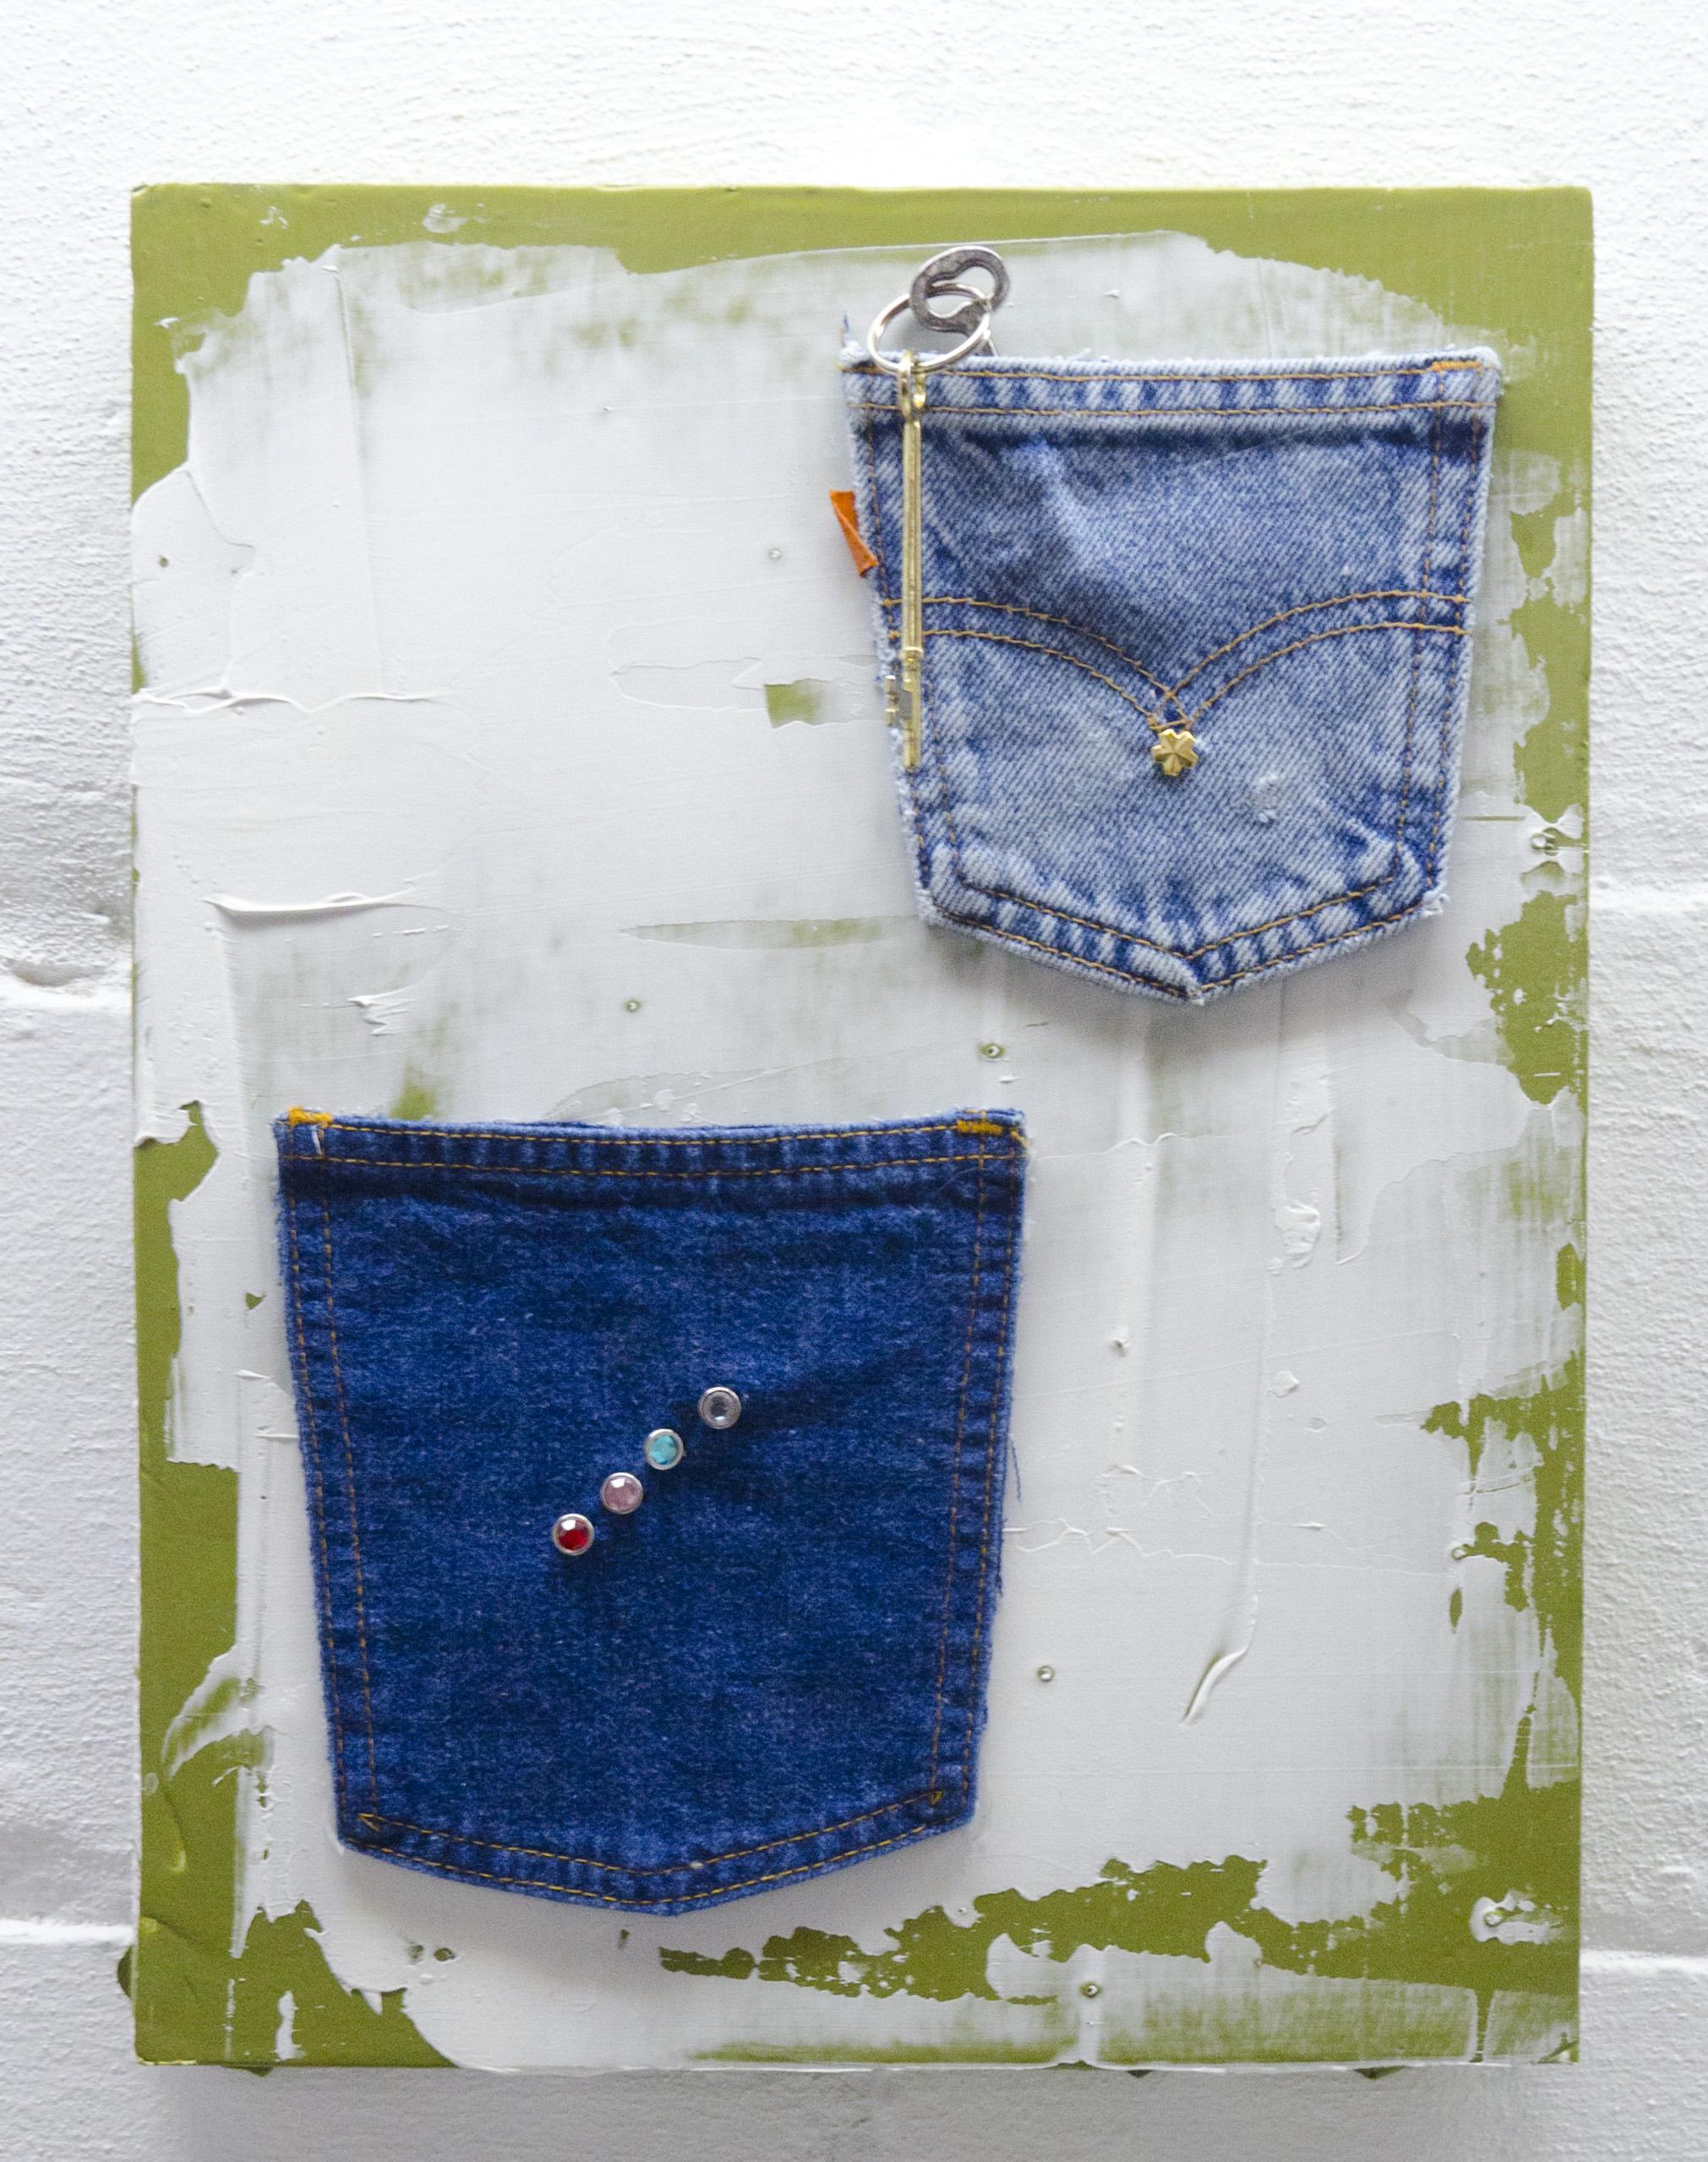 Yours or Mine?   2017  Denim pocket, rhinestones, keys, modeling paste, and acrylic on foam board